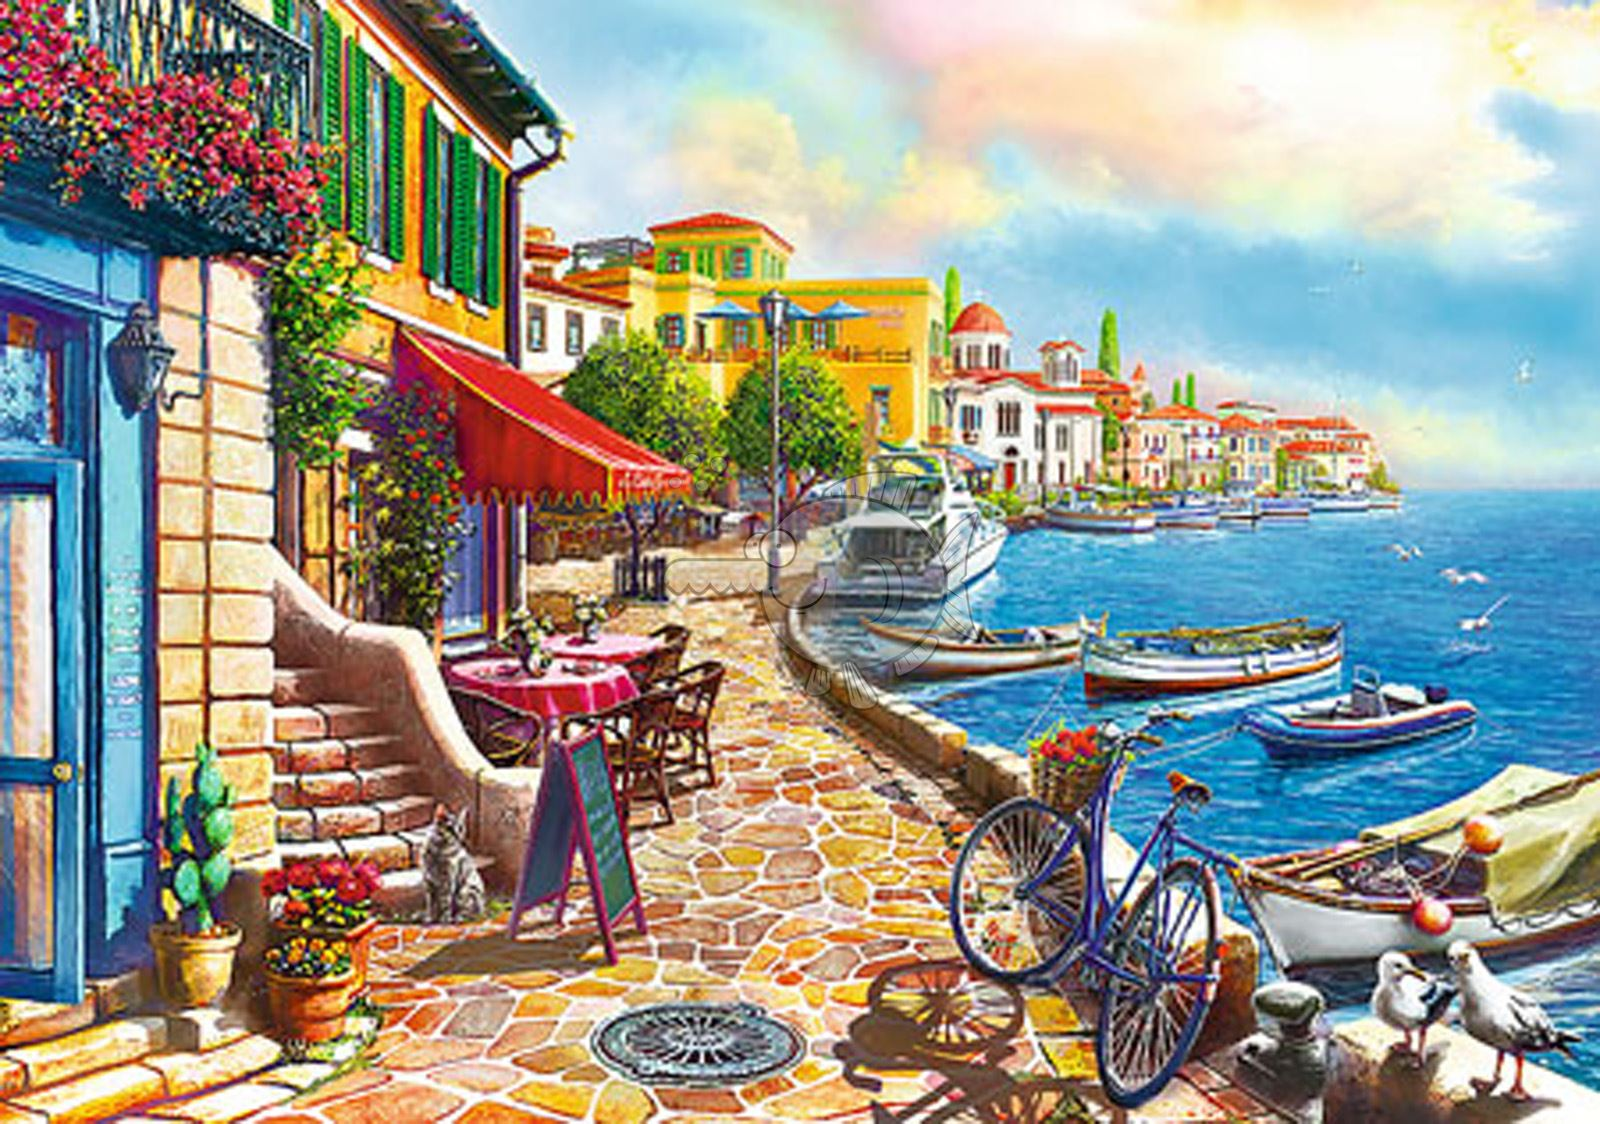 Trefl-300-500-1000-1500-2000-3000-4000-6000-Piece-Jigsaw-Puzzle-Landscapes-City thumbnail 358